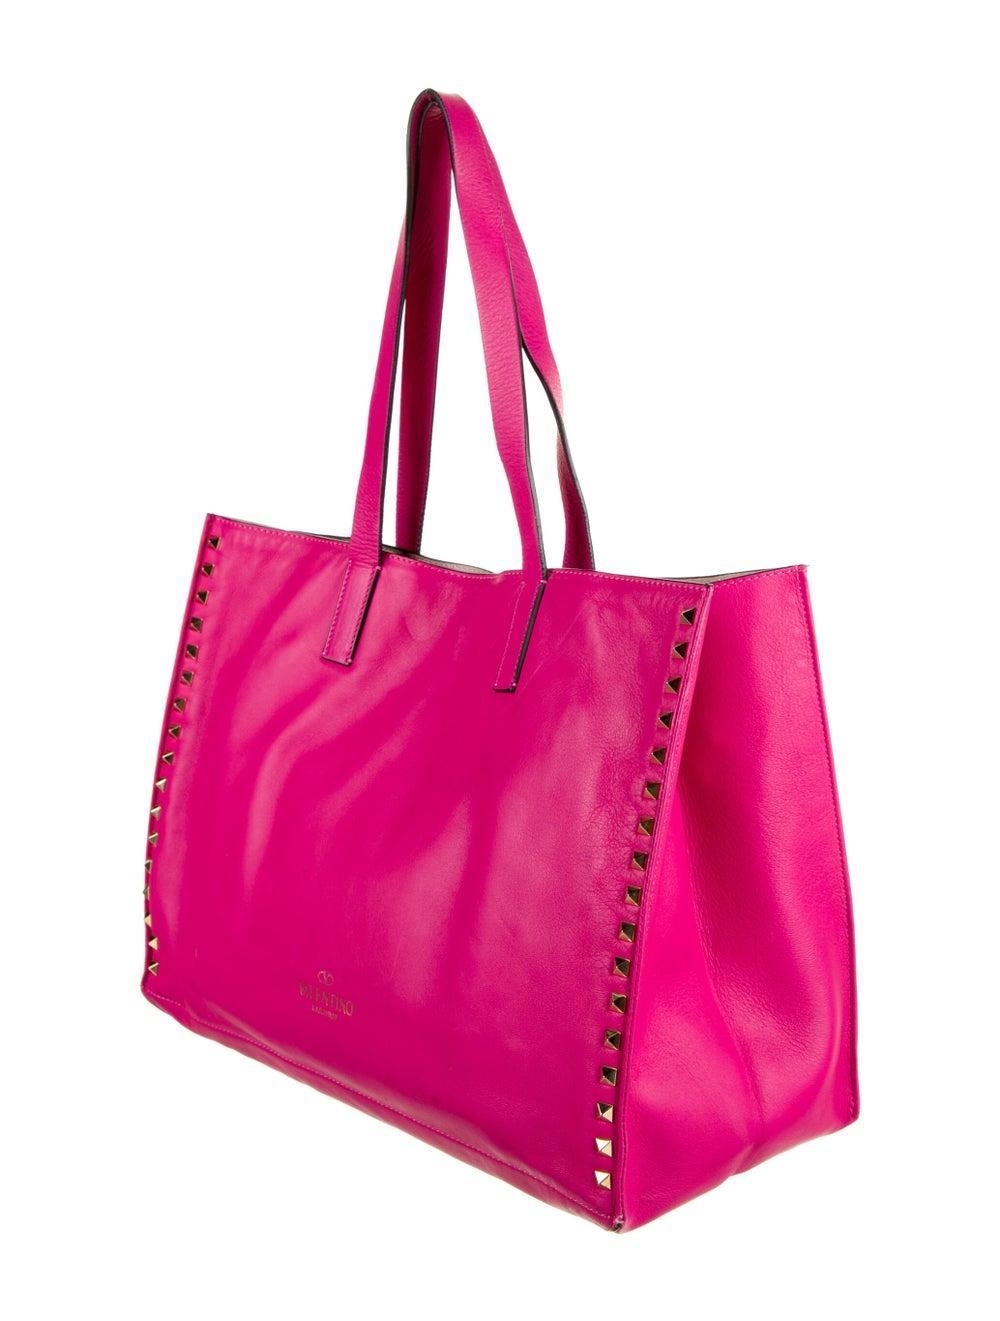 Valentino Rockstud Leather Tote Pink - image 3